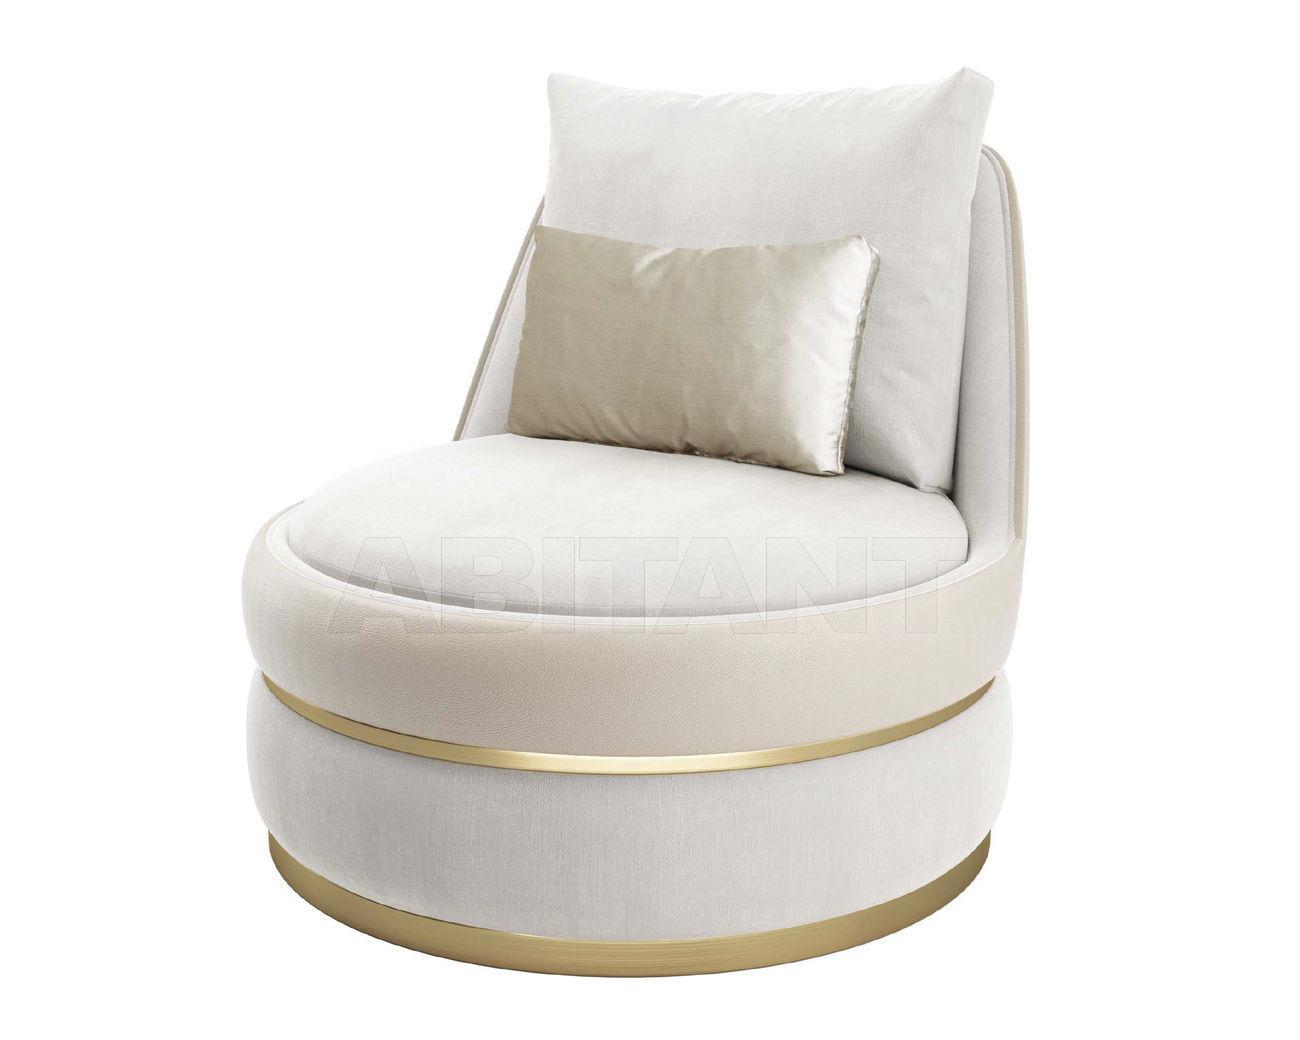 Купить Кресло DALBY Frato 2018 FUP050009AAB B